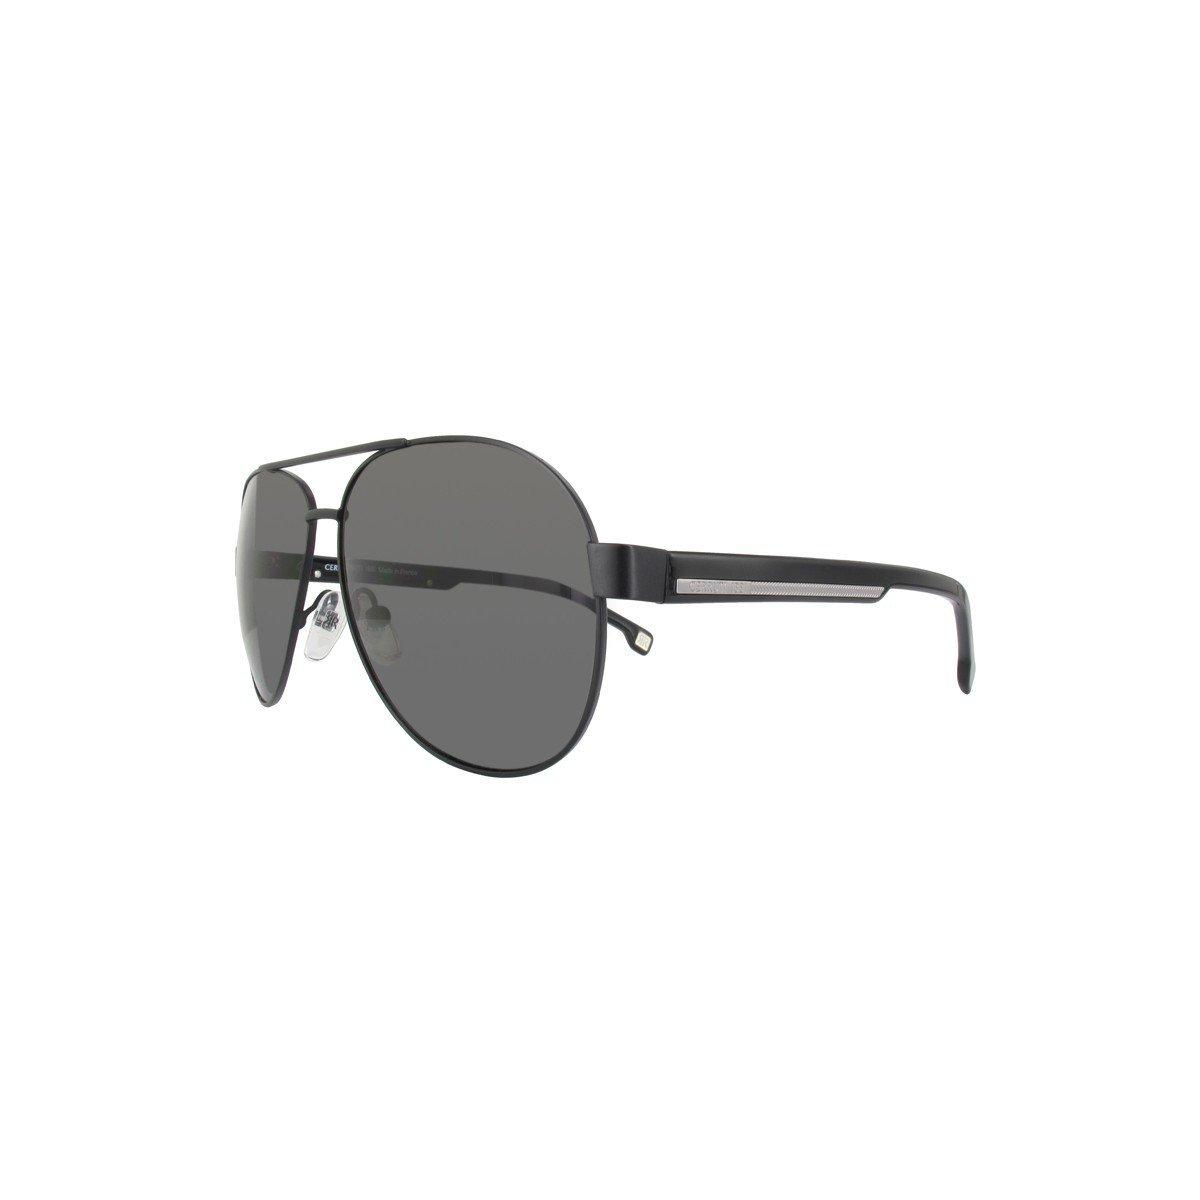 502eb270a94c Cerruti 1881 CE 8061 00 Black / Brown Men Aviator Sunglasses CE806100:  Amazon.co.uk: Clothing